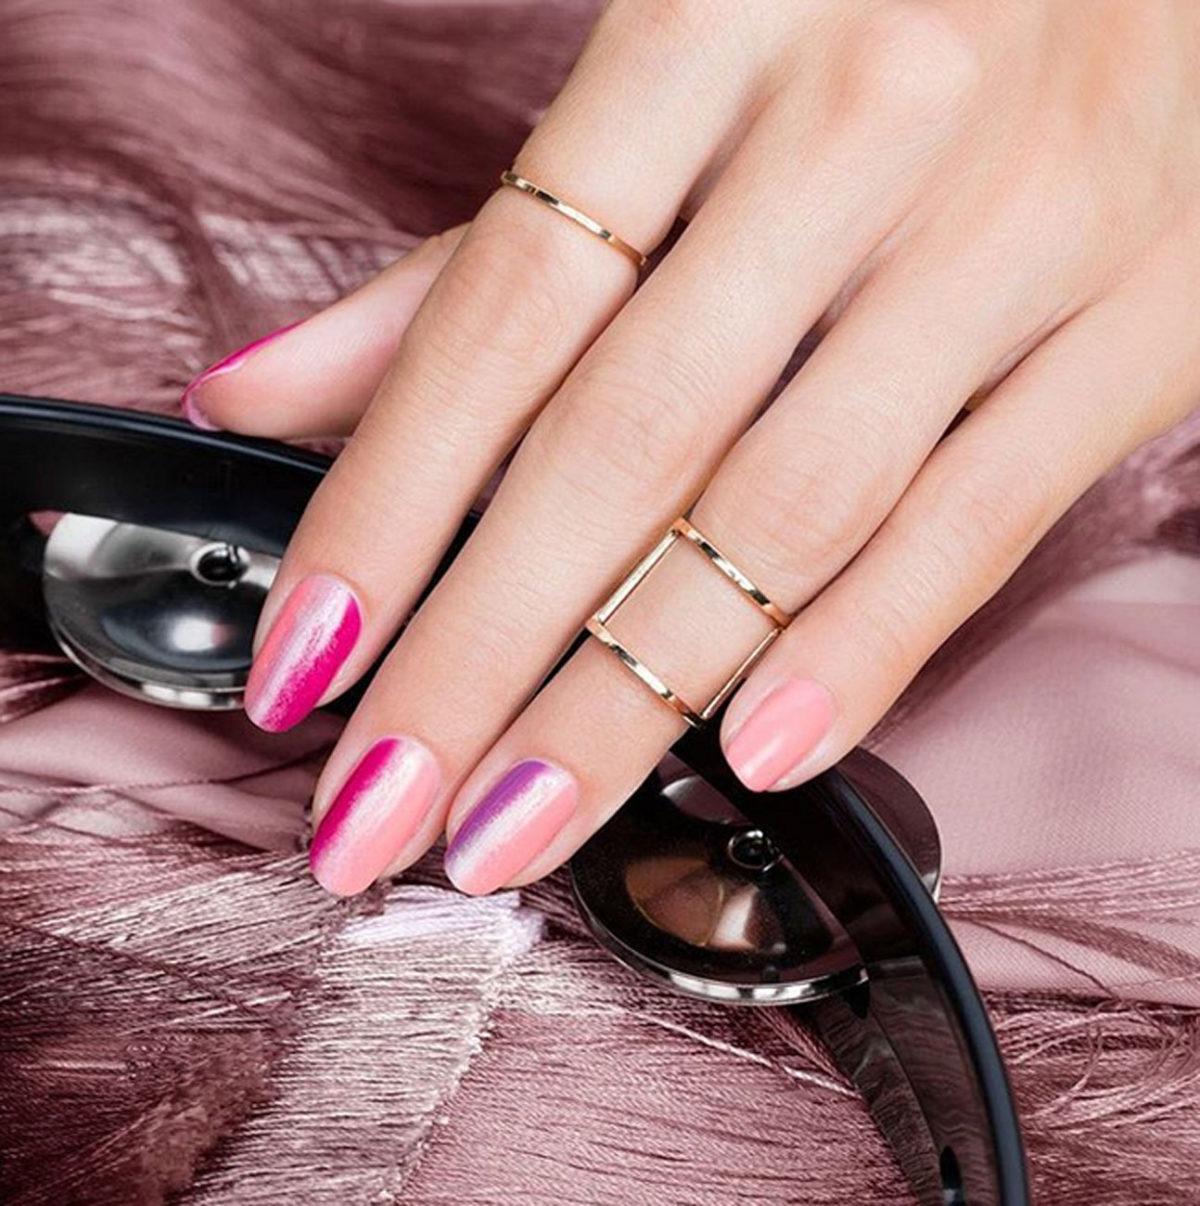 Beauty-Trend: Ombré auf den Nägeln!